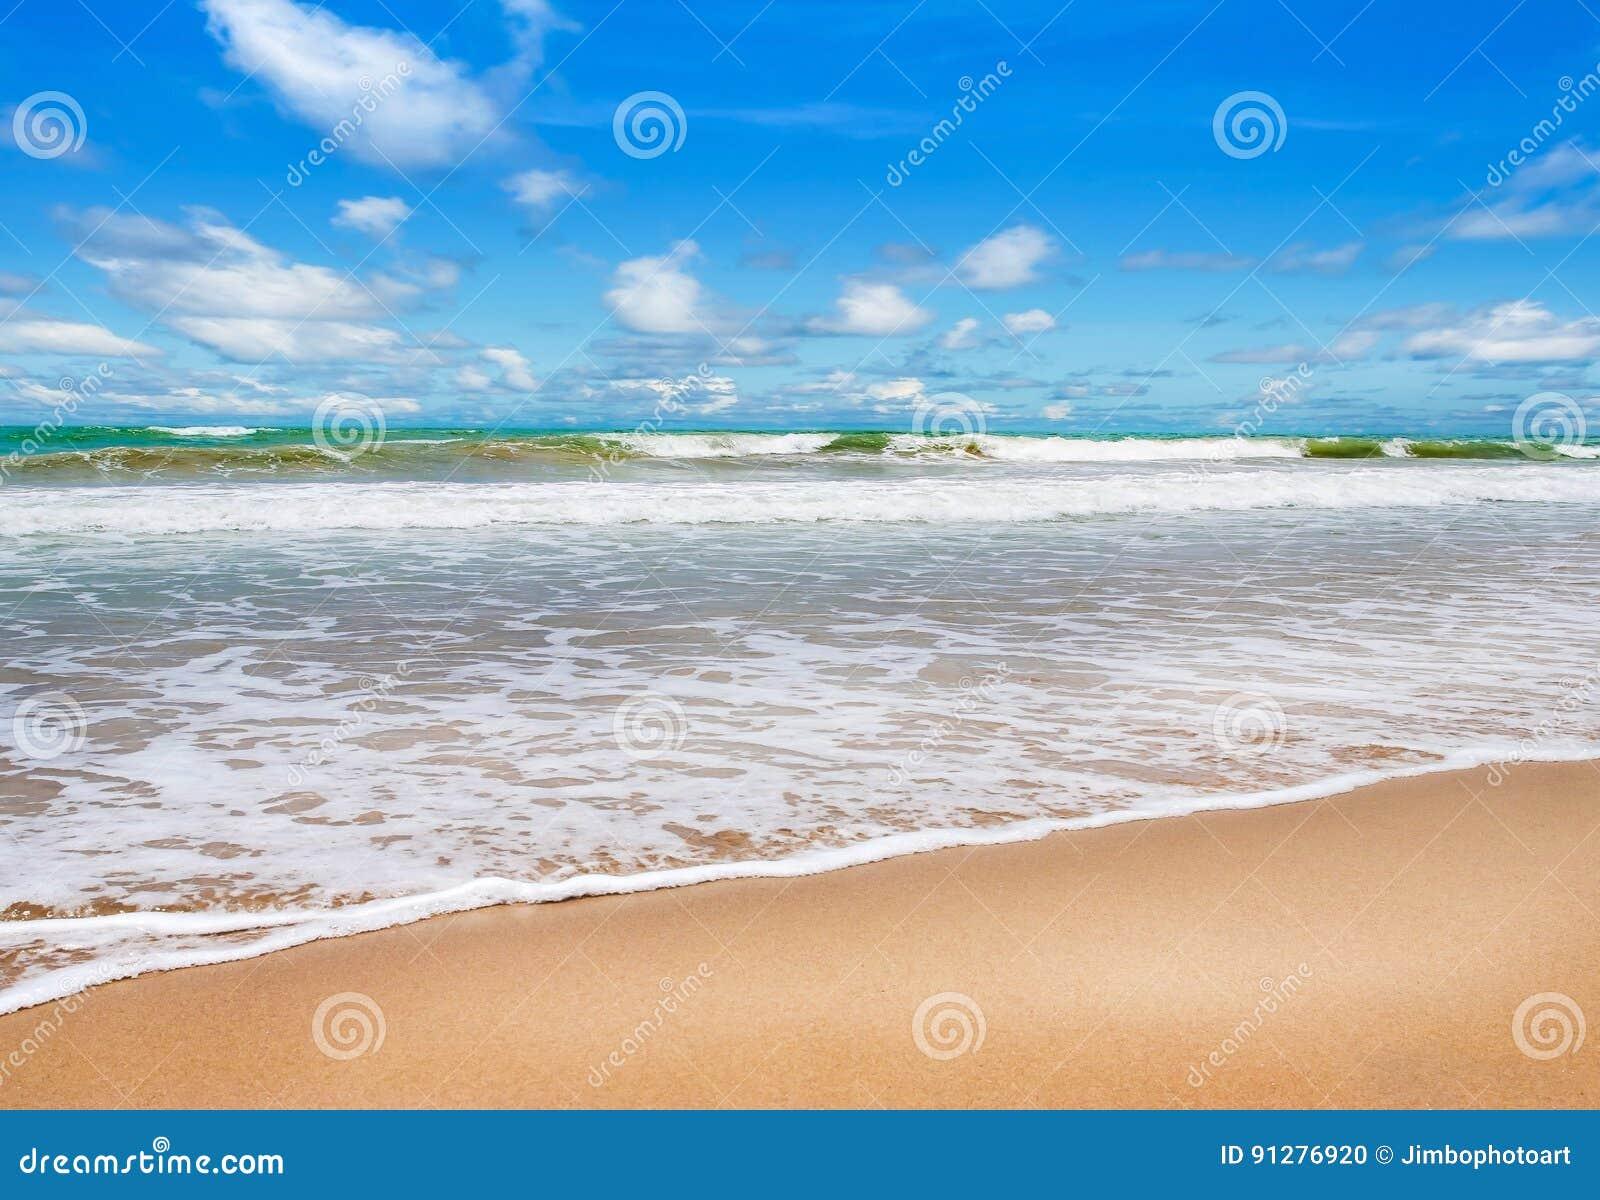 Strand med blå havs- och vitsand i blå himmel